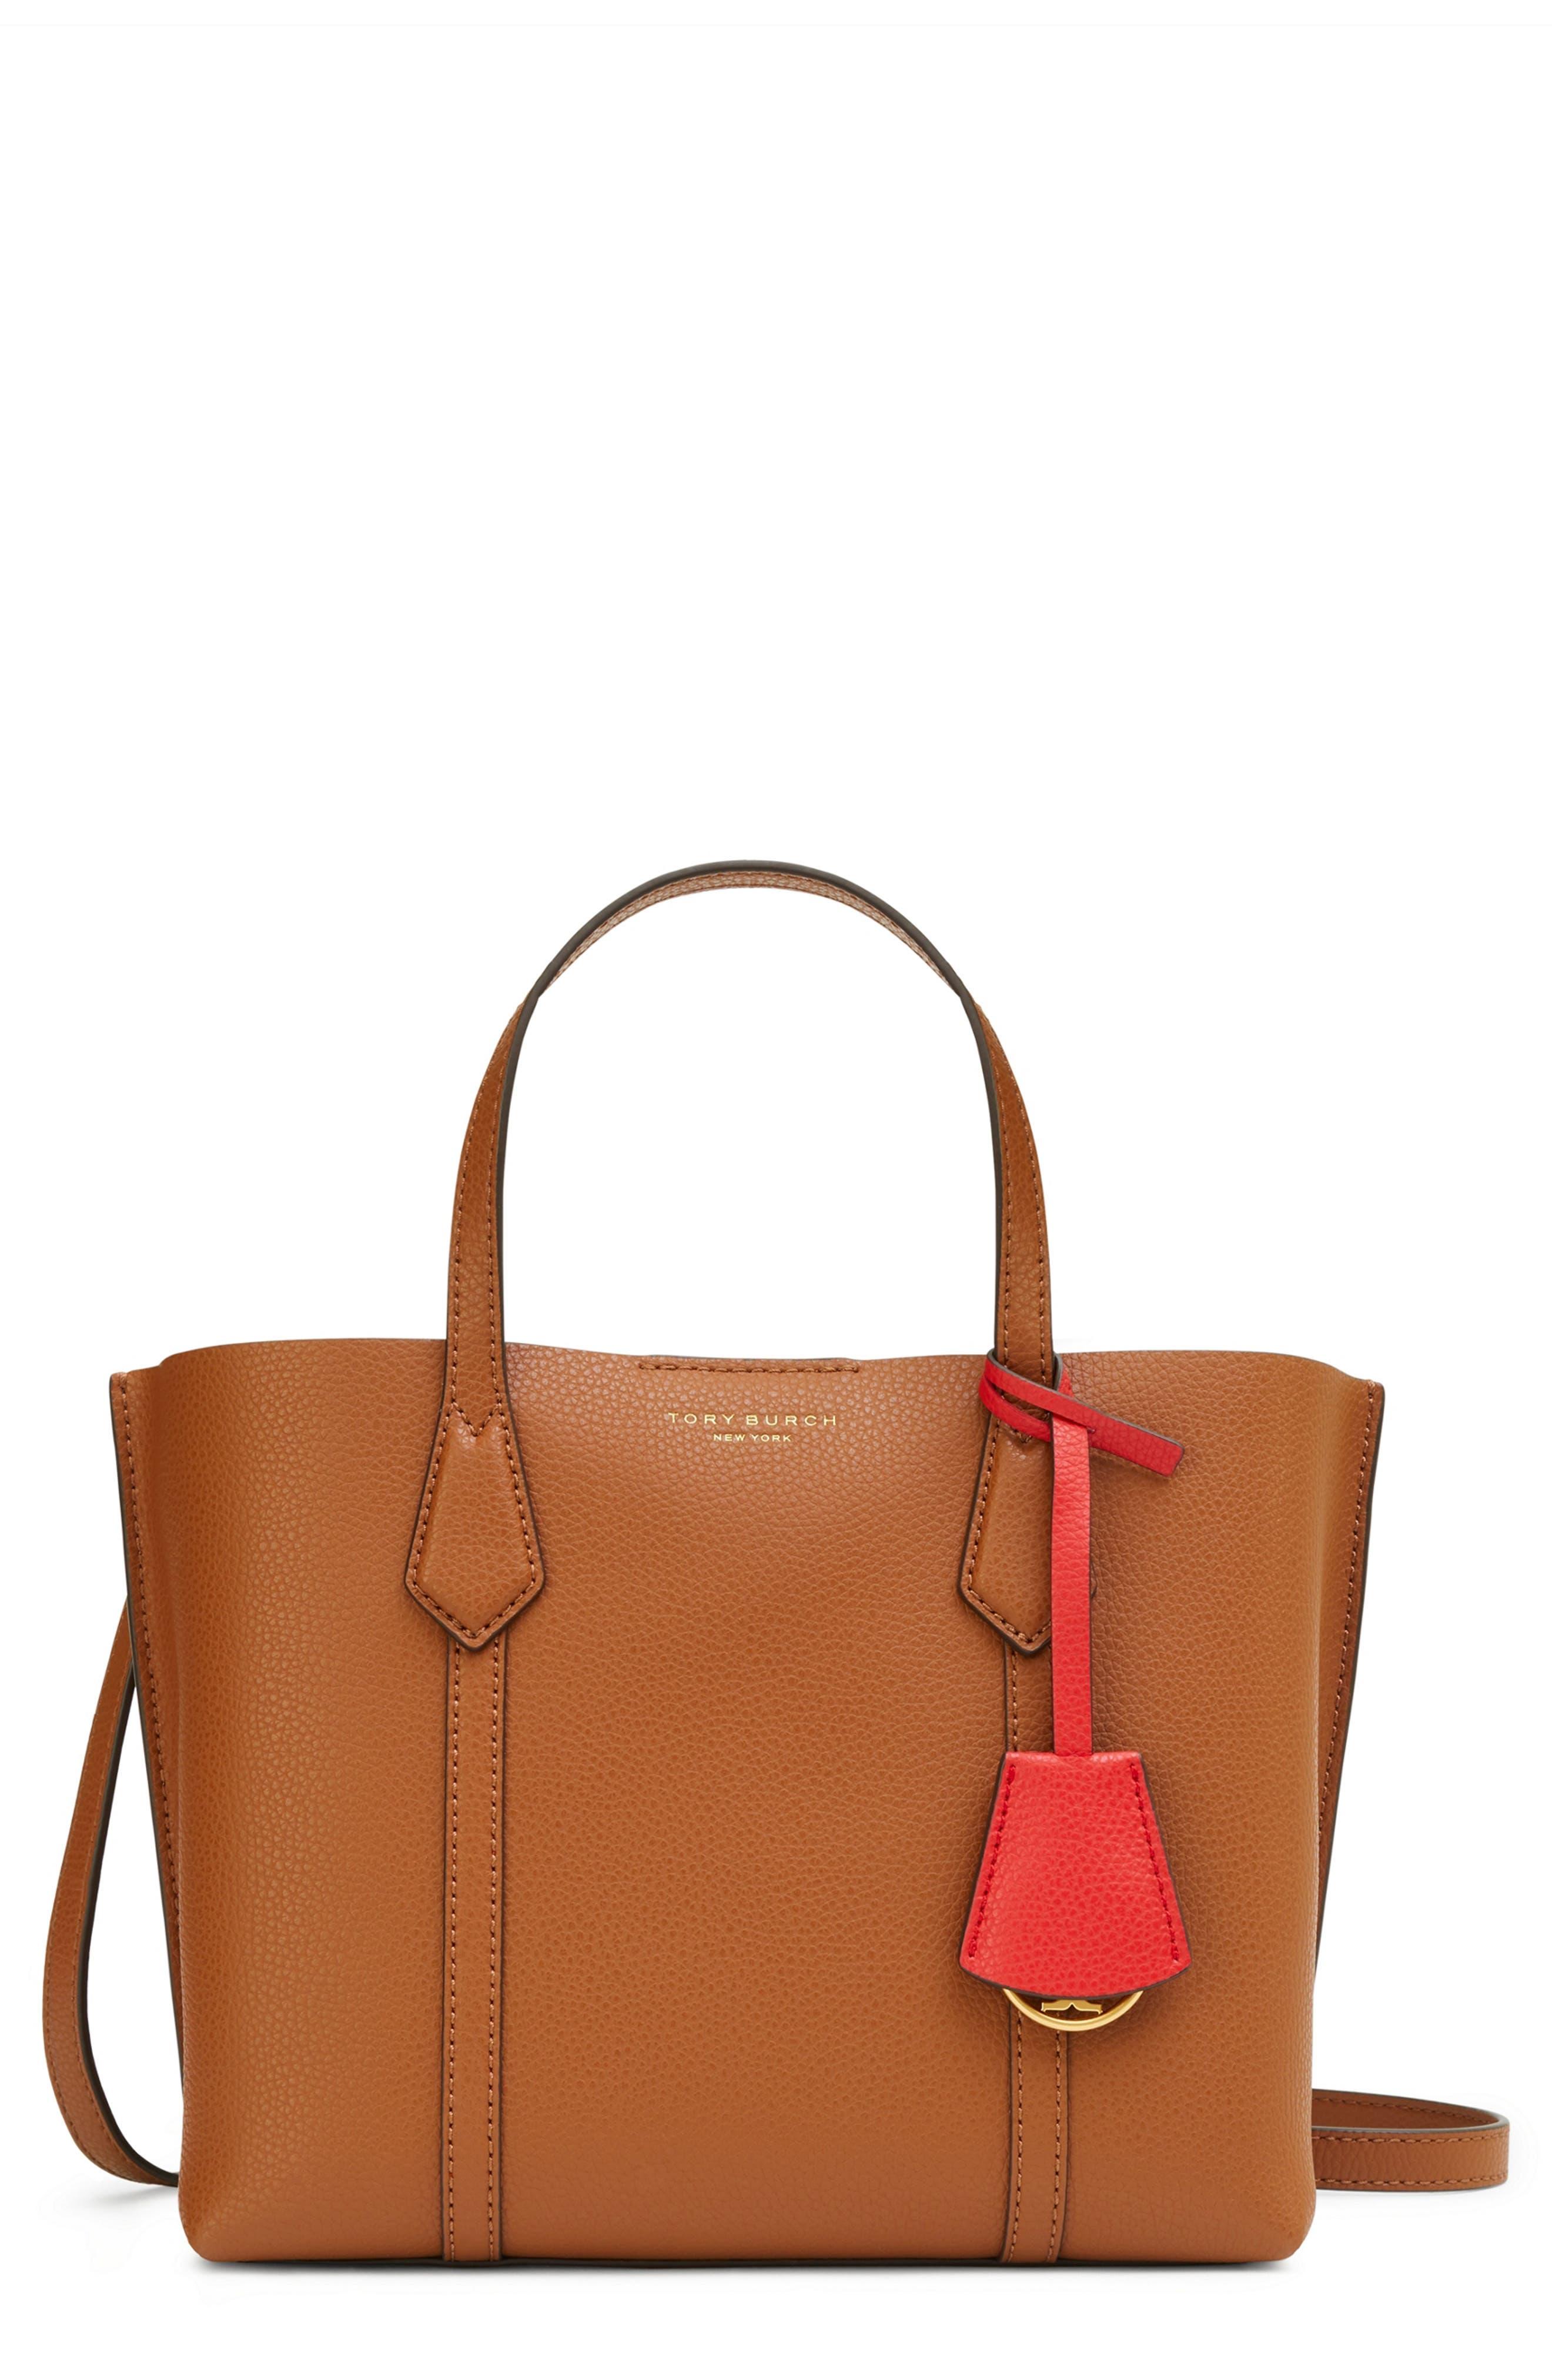 Marc By Marc Jacobs Shiny Designer Handbags Shoulder Purse Tote Black Orange M